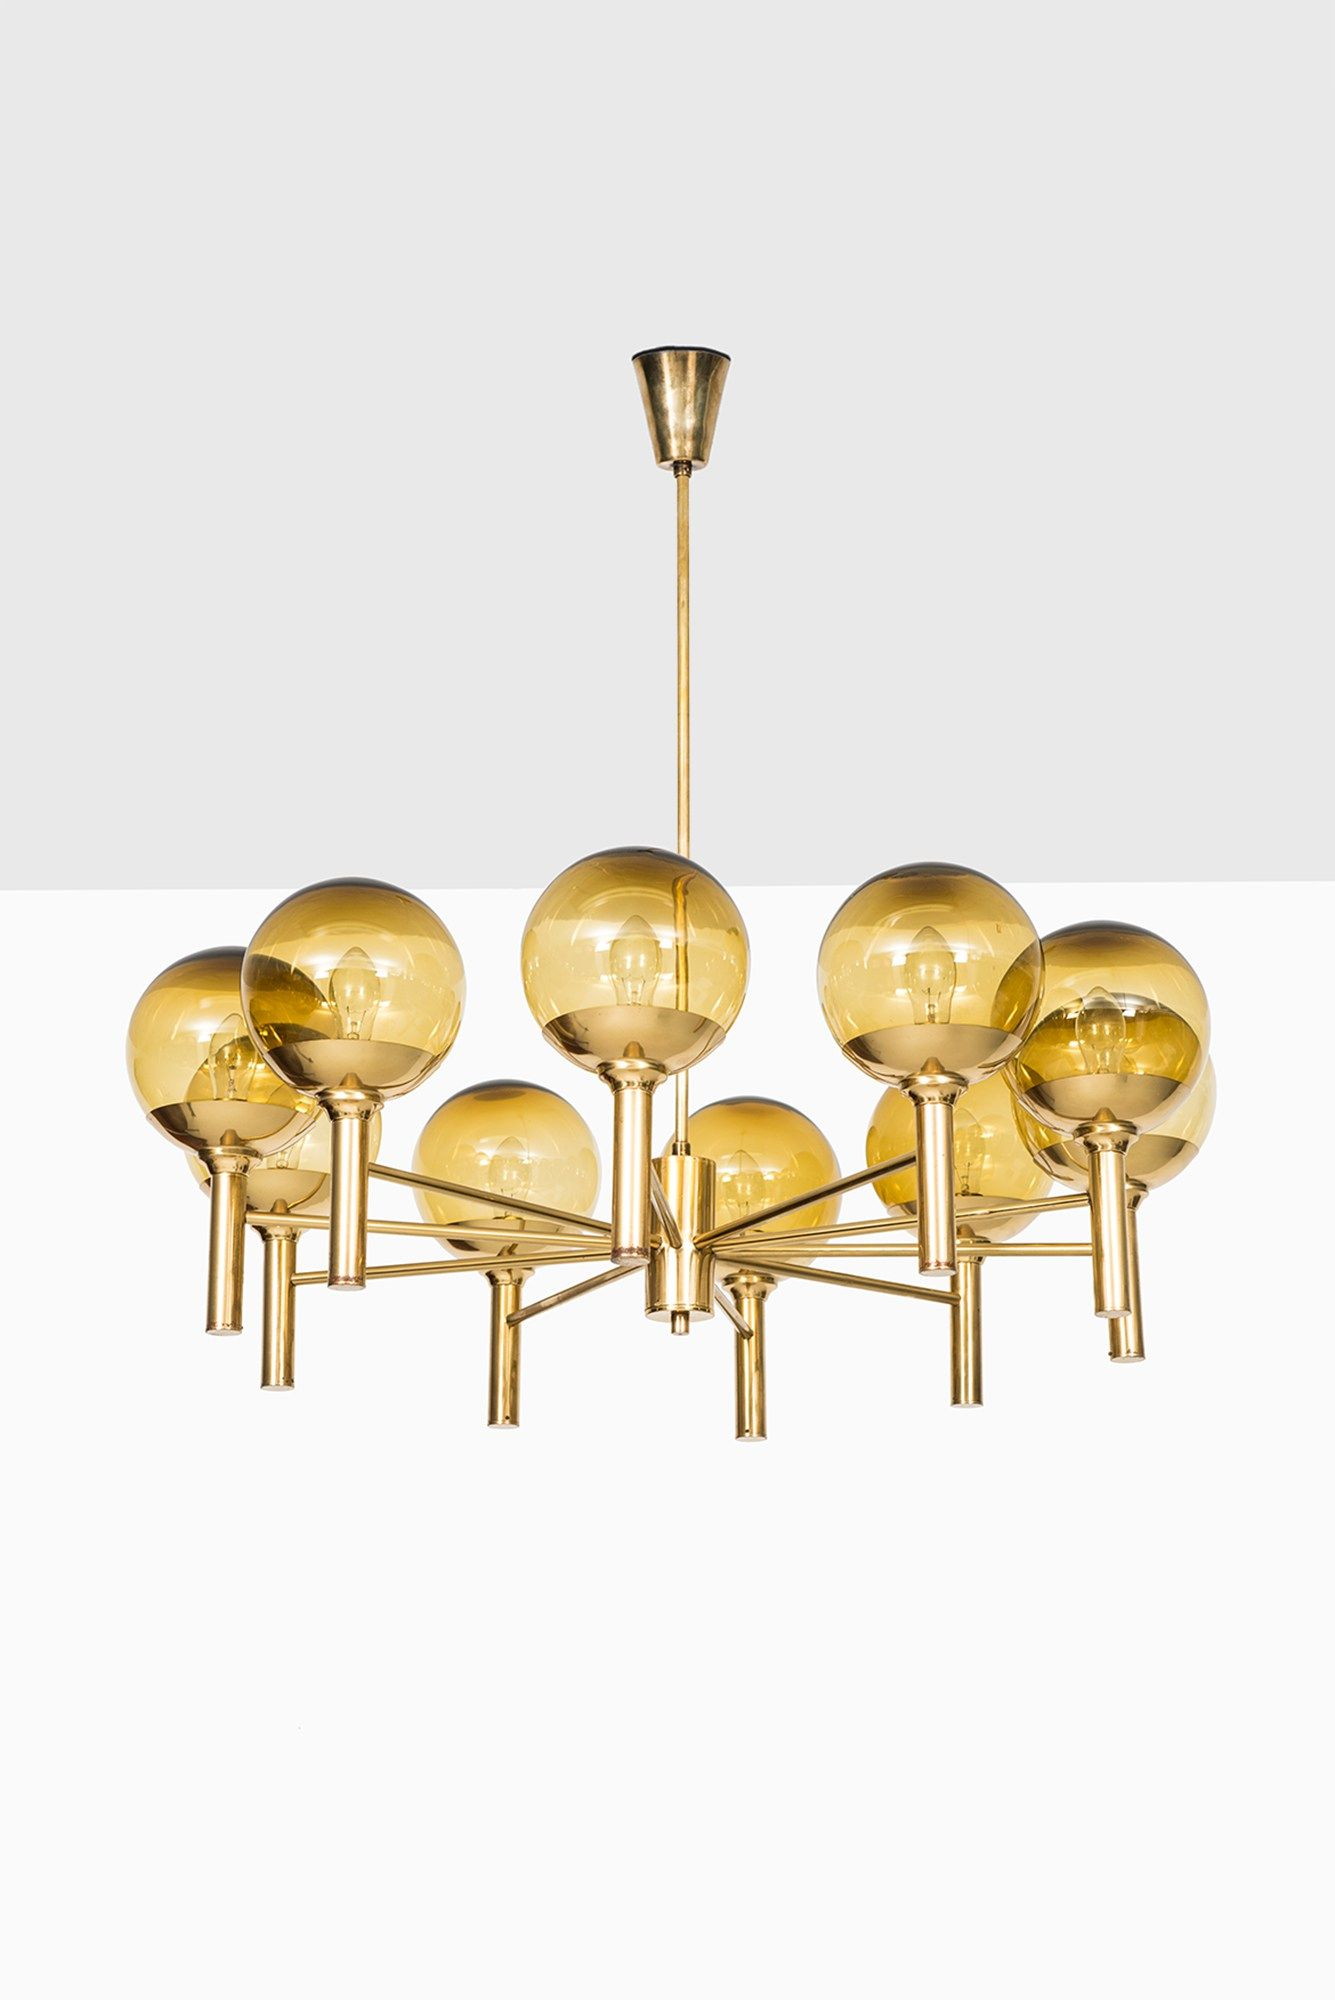 Sold lit pinterest studio lights and ceilings